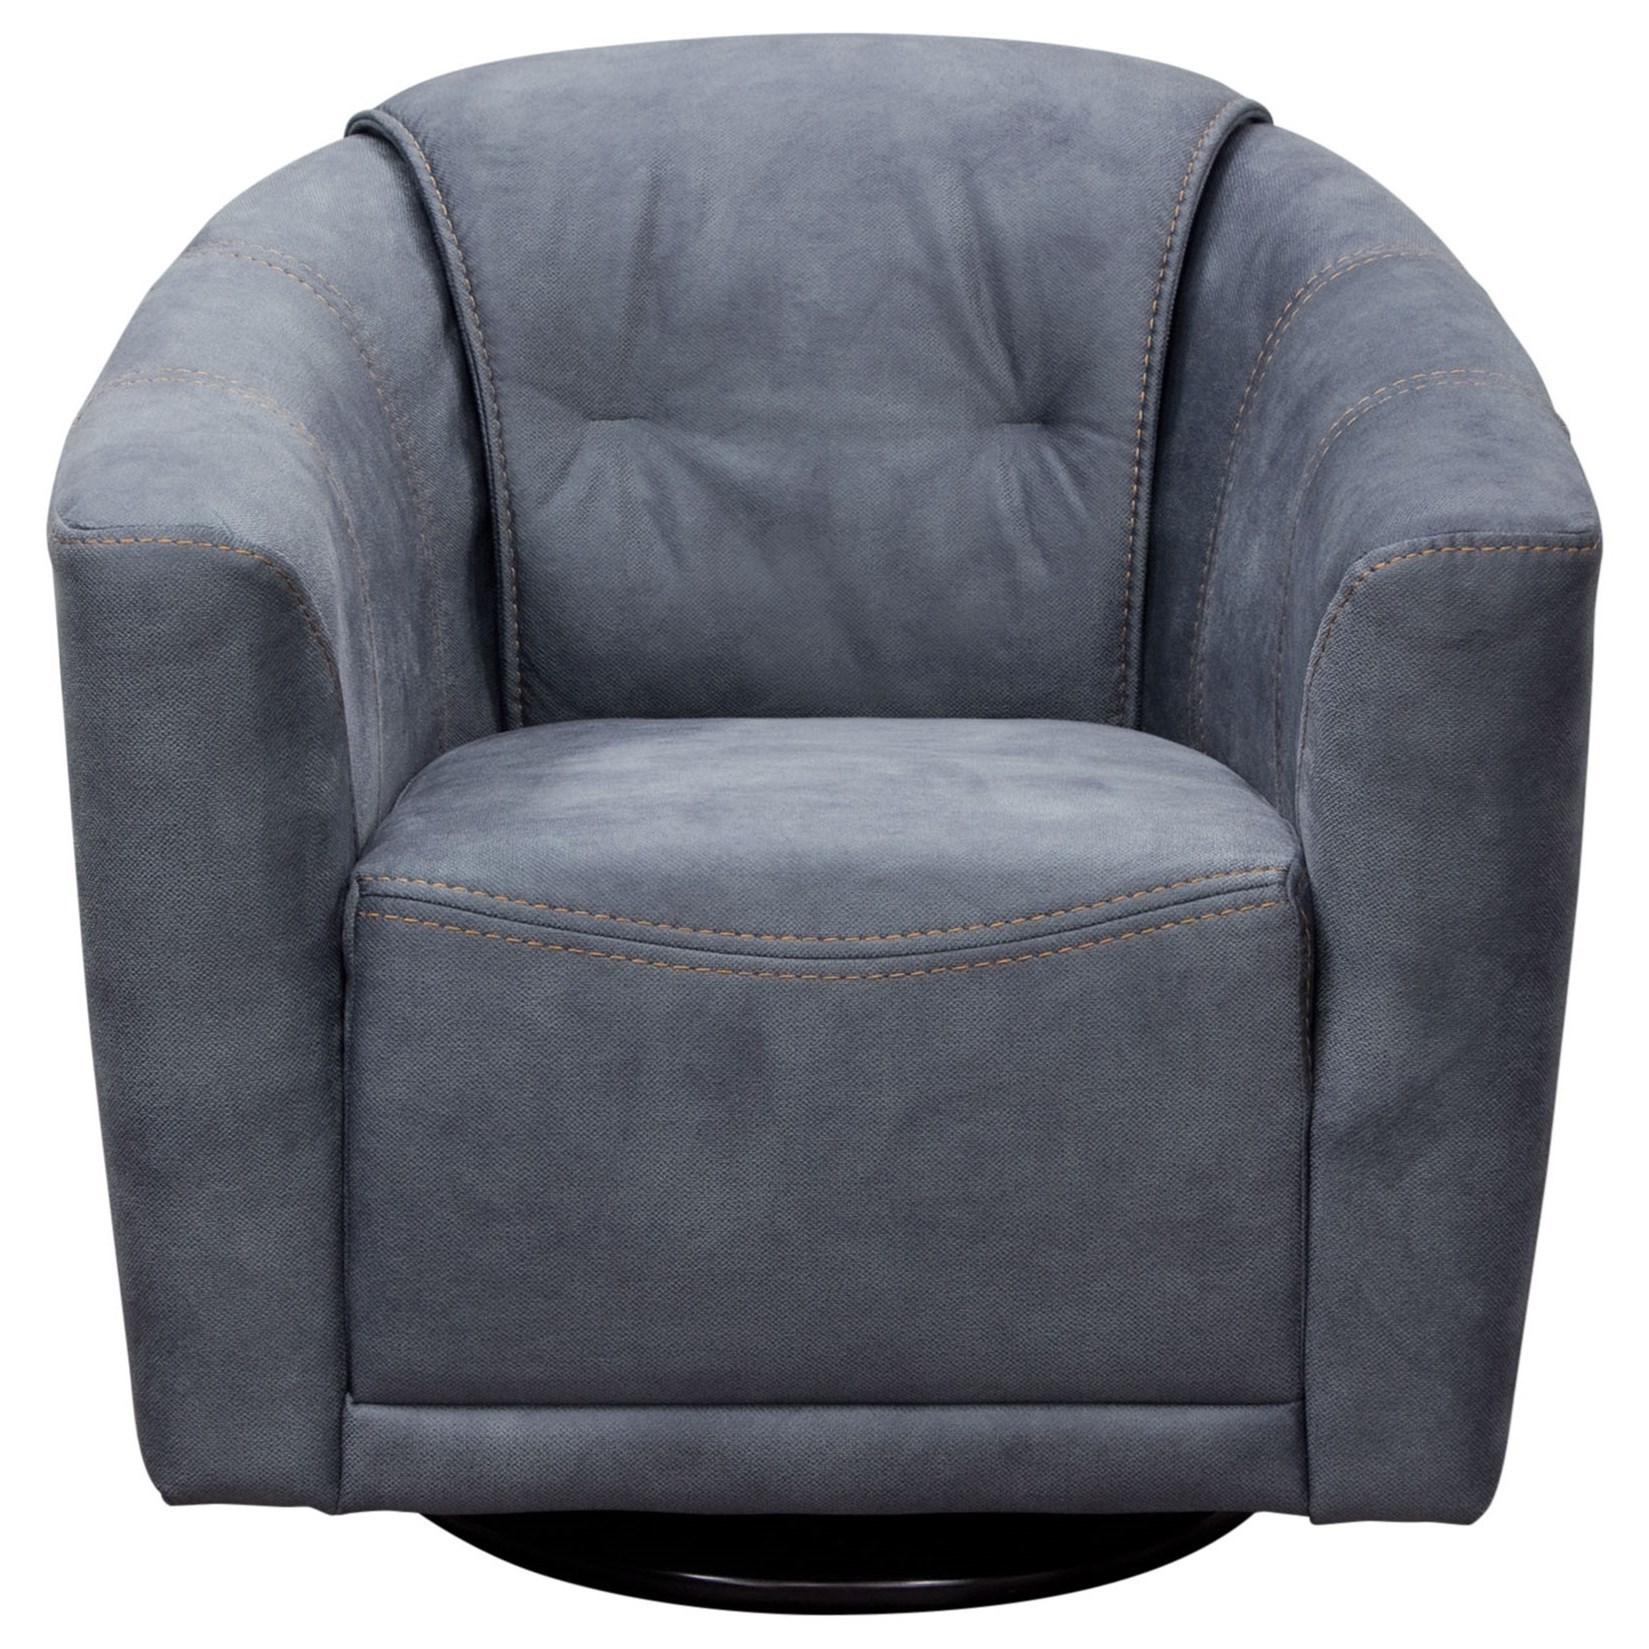 Diamond Sofa Accent ChairsMurphy Swivel Chair ...